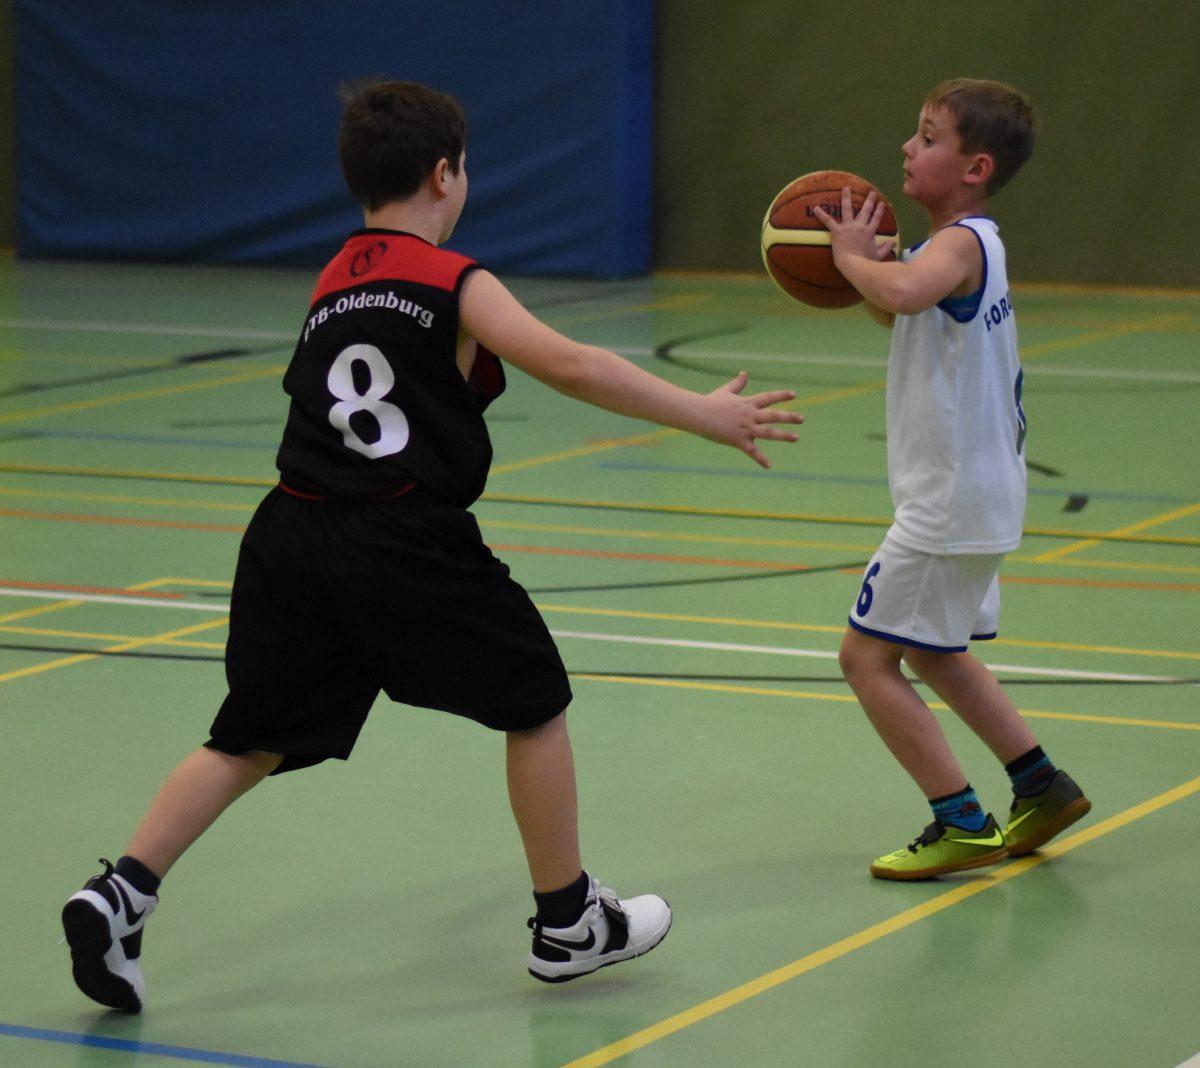 3:121 – U10 gegen Tabellenführer Bürgerfelde chancenlos